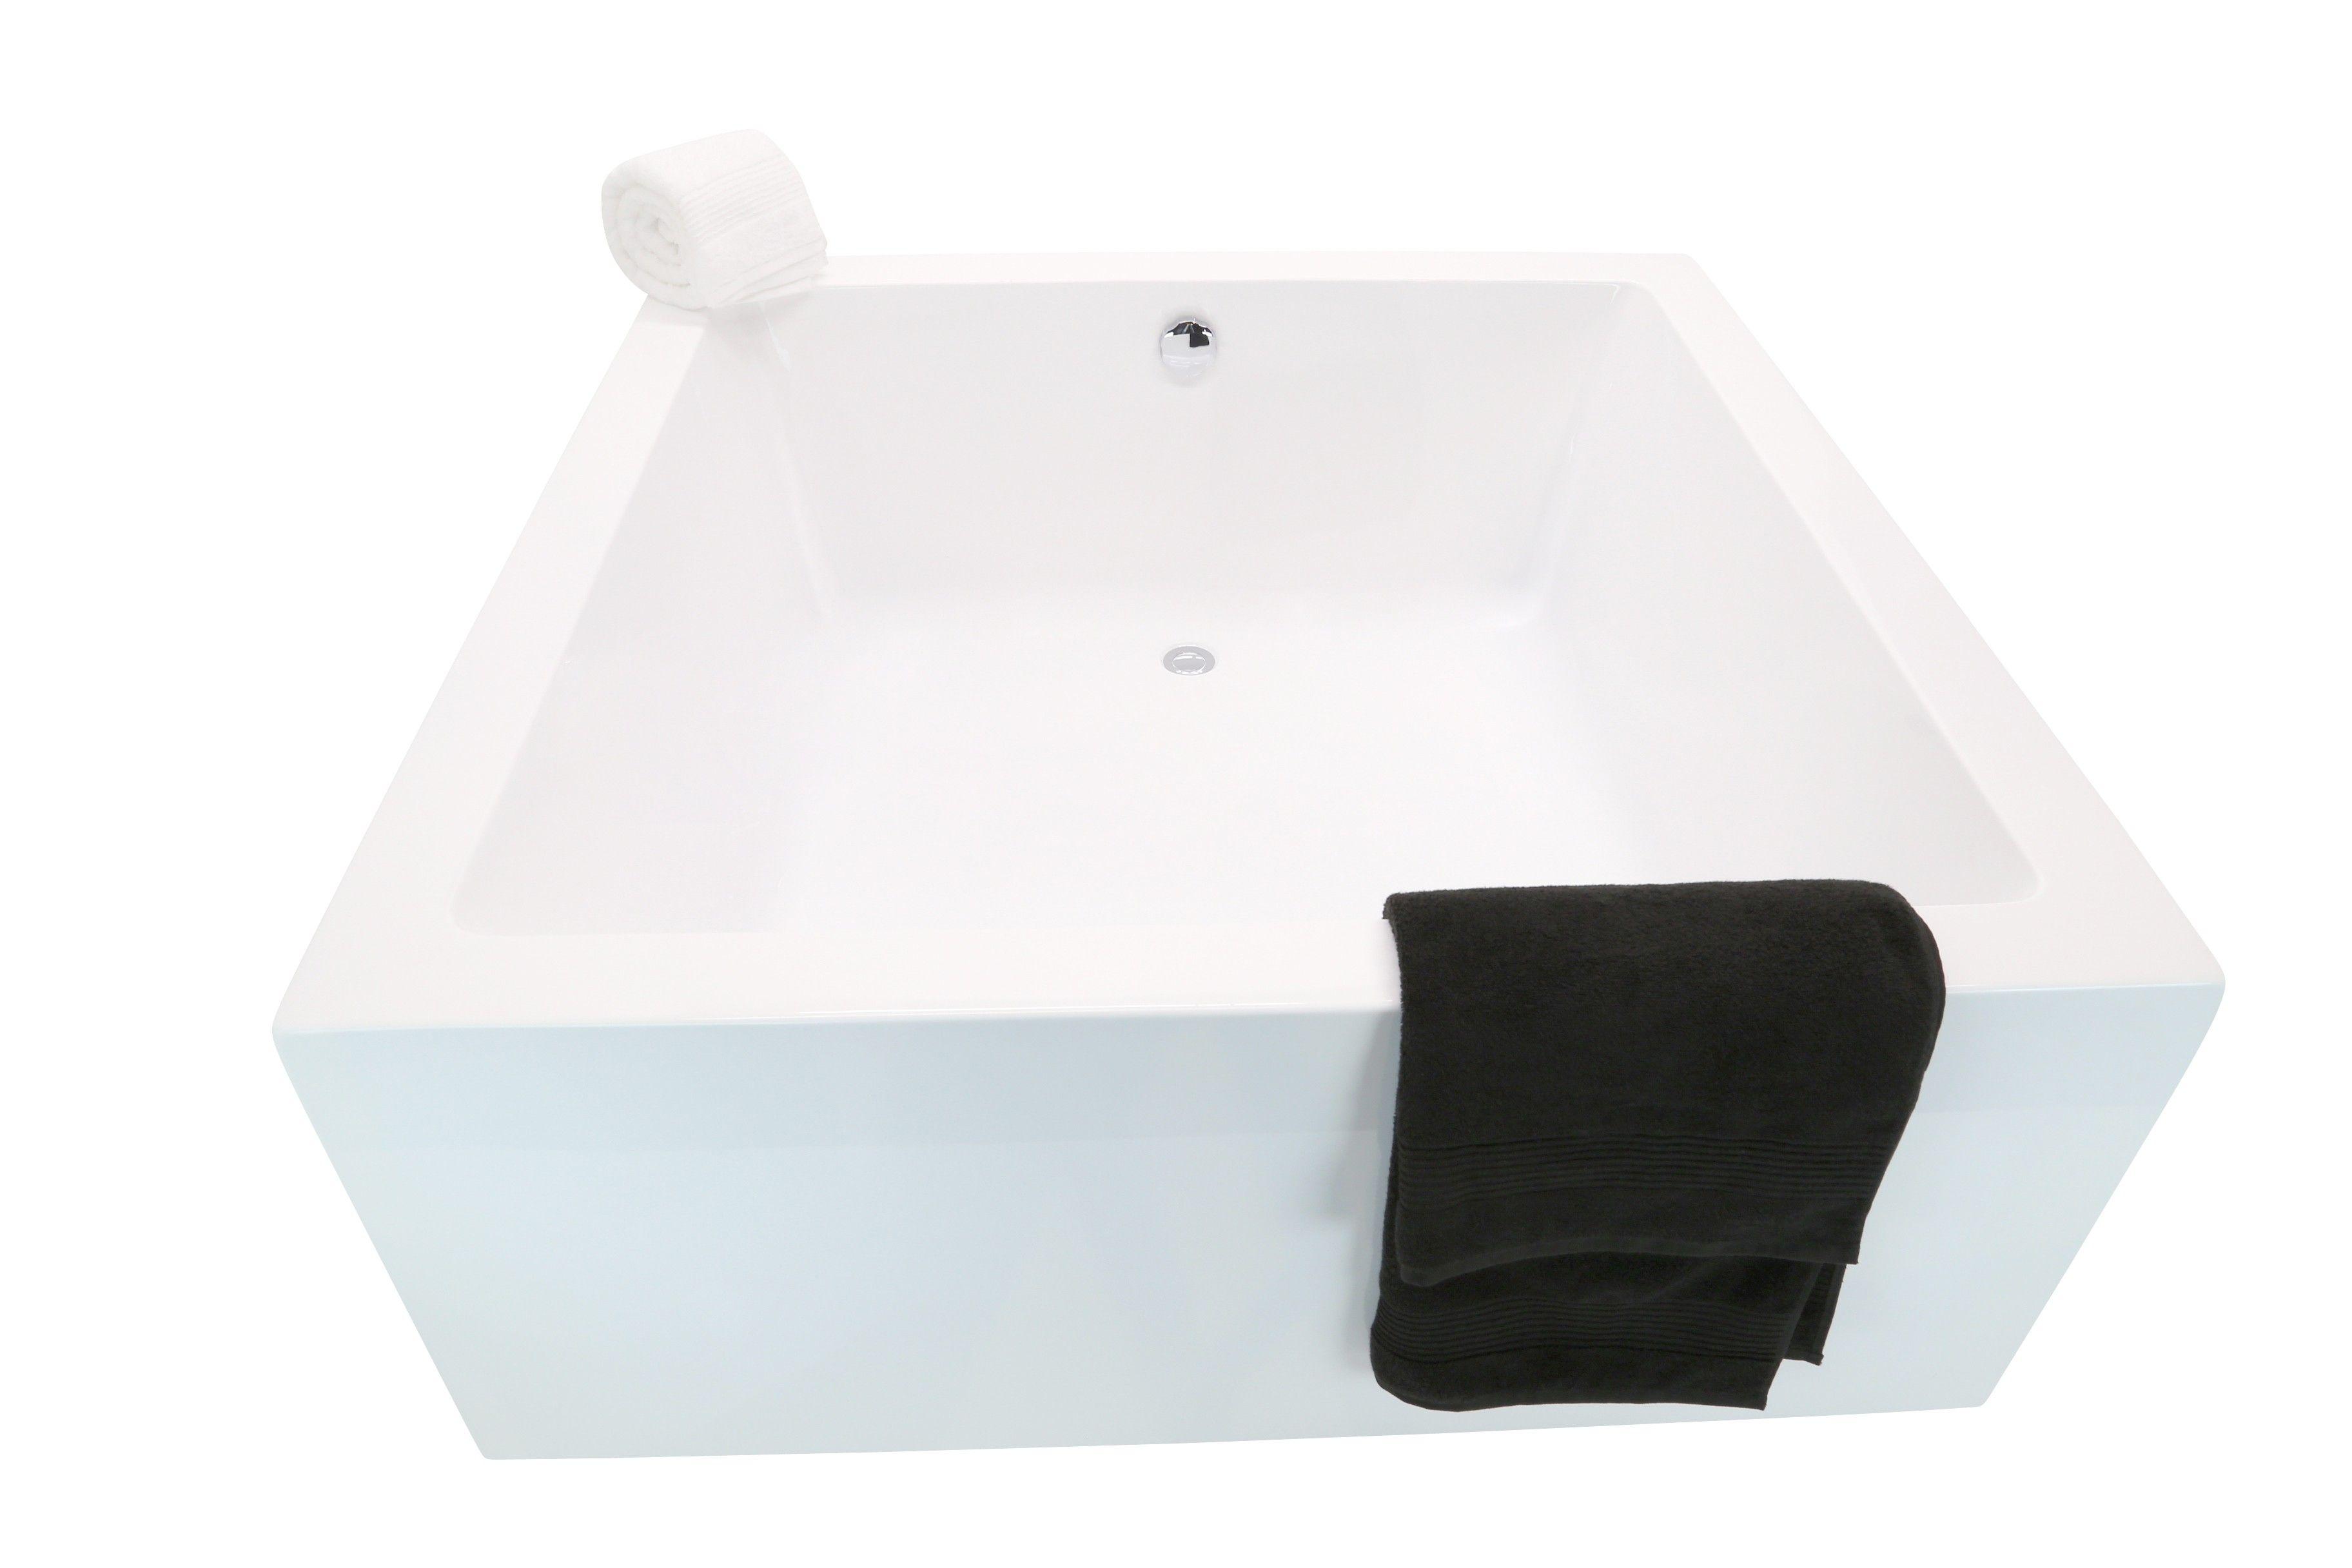 55 x 55 Square Freestanding Bathtub - White Tub FT-AZ-400 | Bath ...